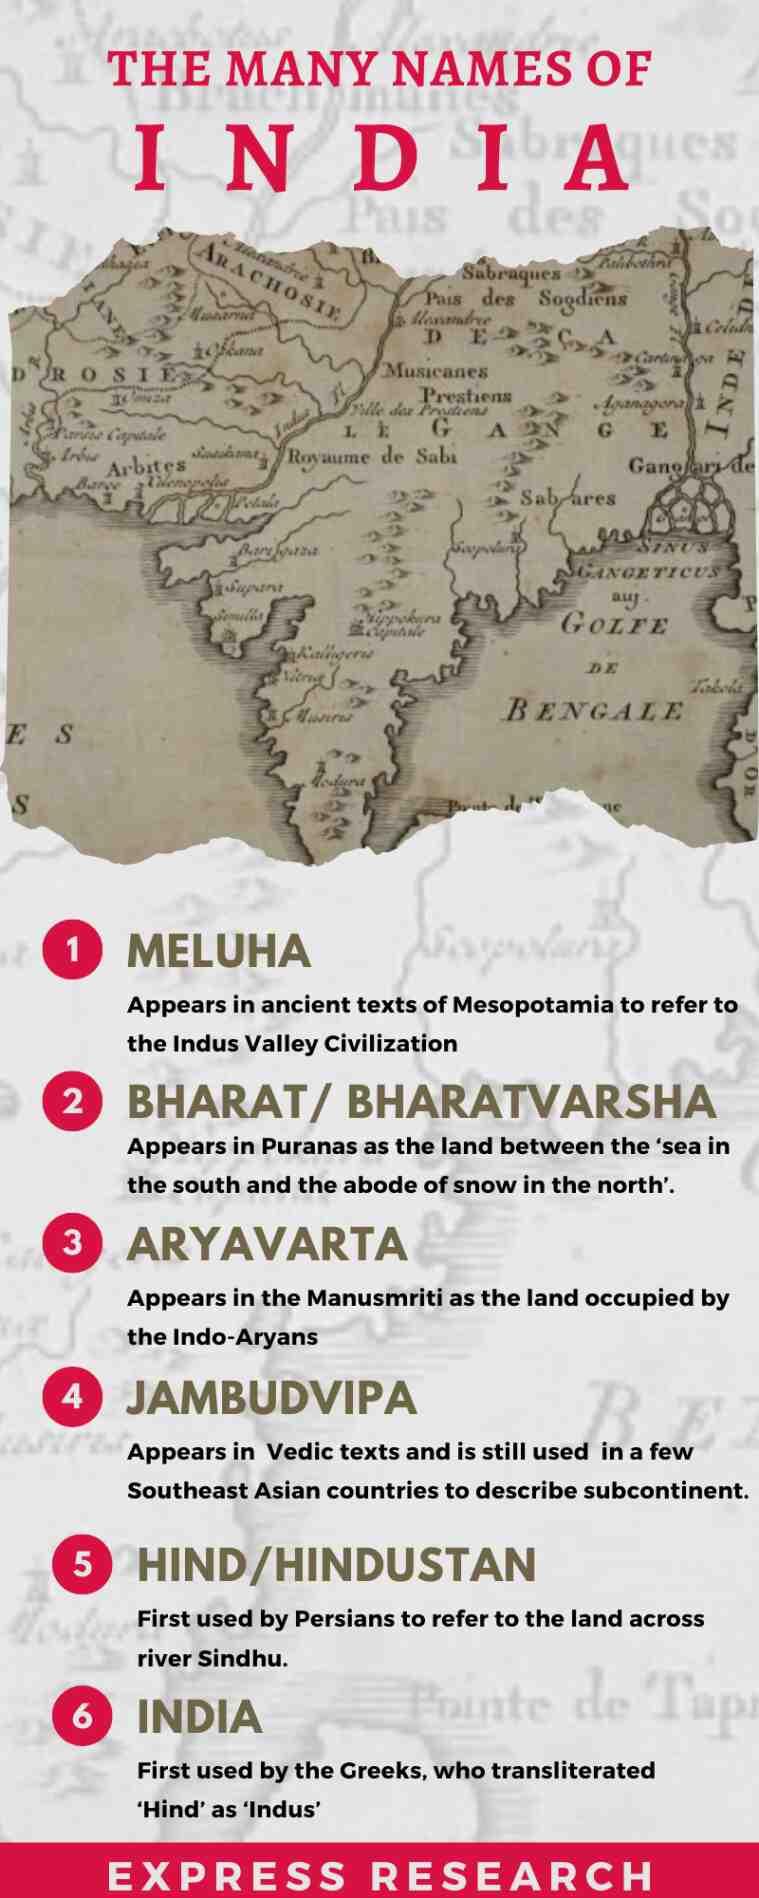 India, Bharat, India name change plea, Hindustan, Hind, names of India, India news, Indian express